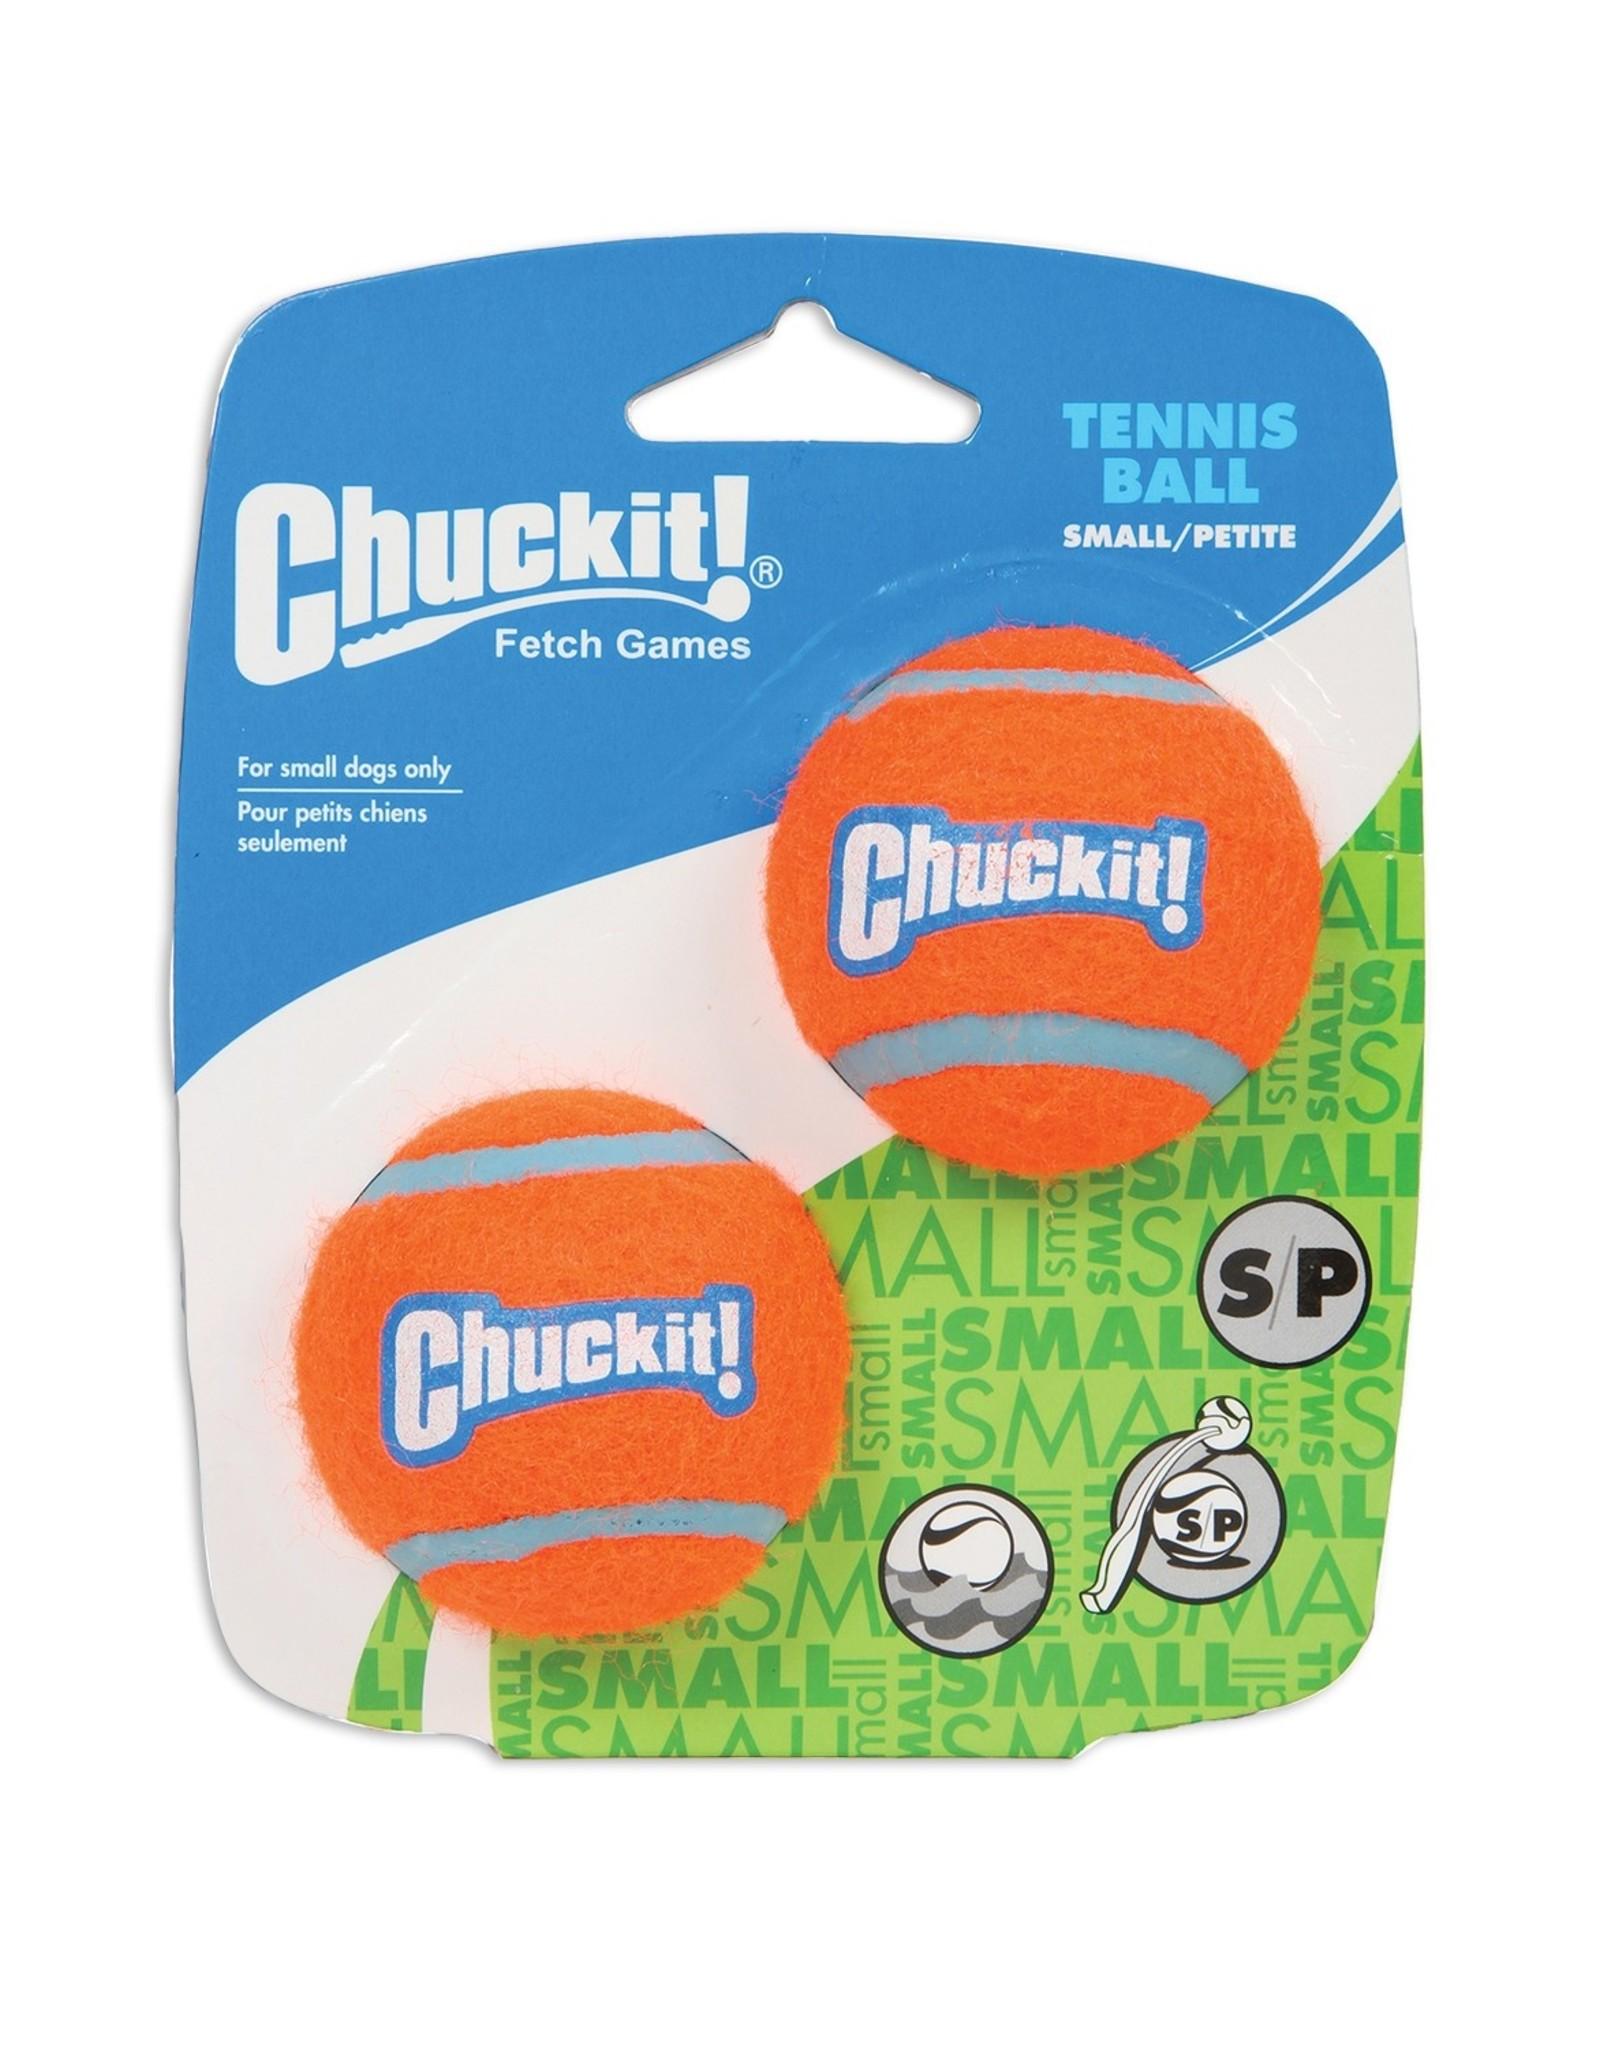 CHUCK IT TENNIS BALL SM 2PK